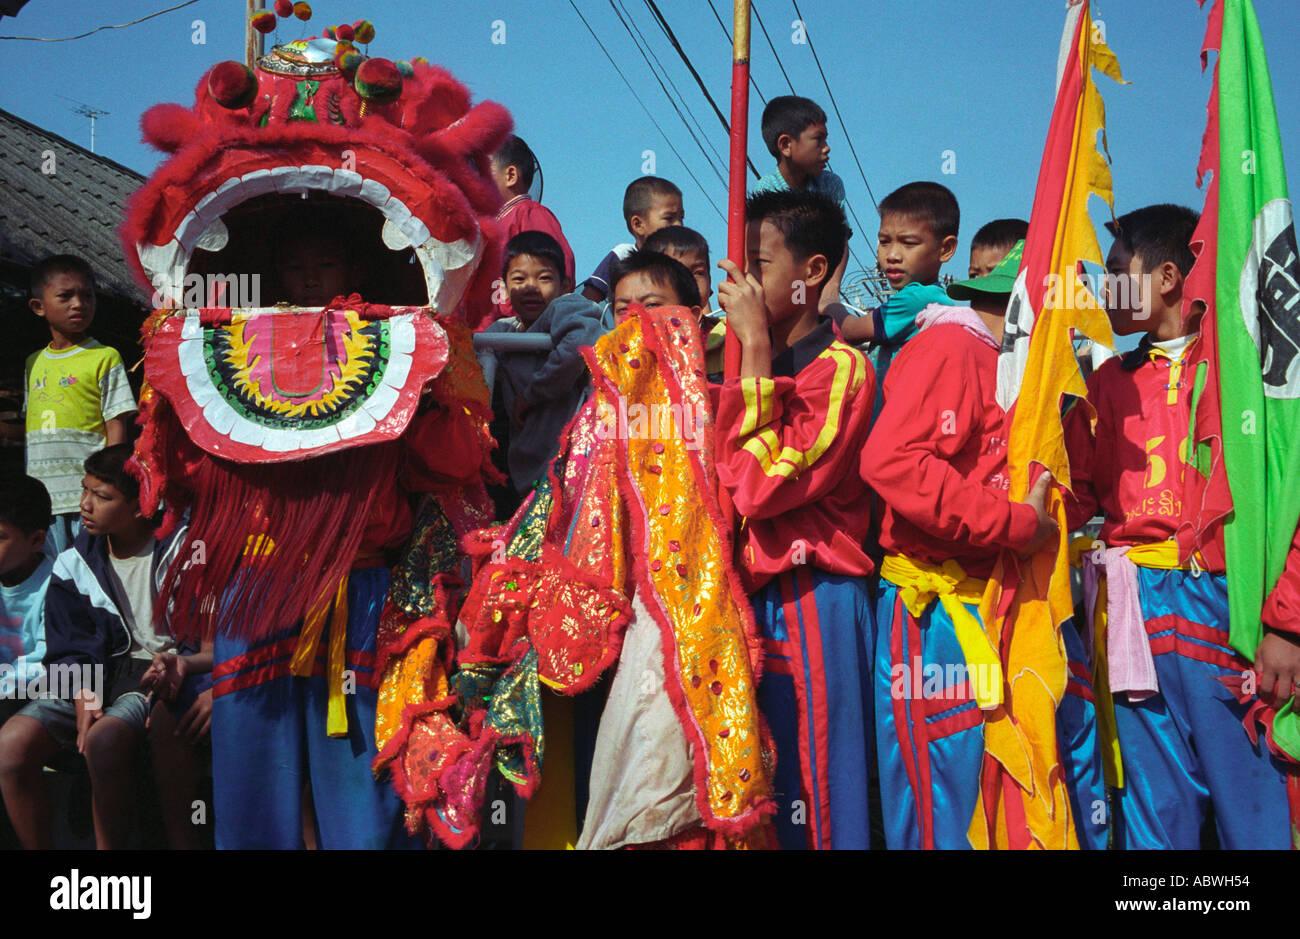 chinese new year celebrations vientiane laos january 2004 - Chinese New Year 2004